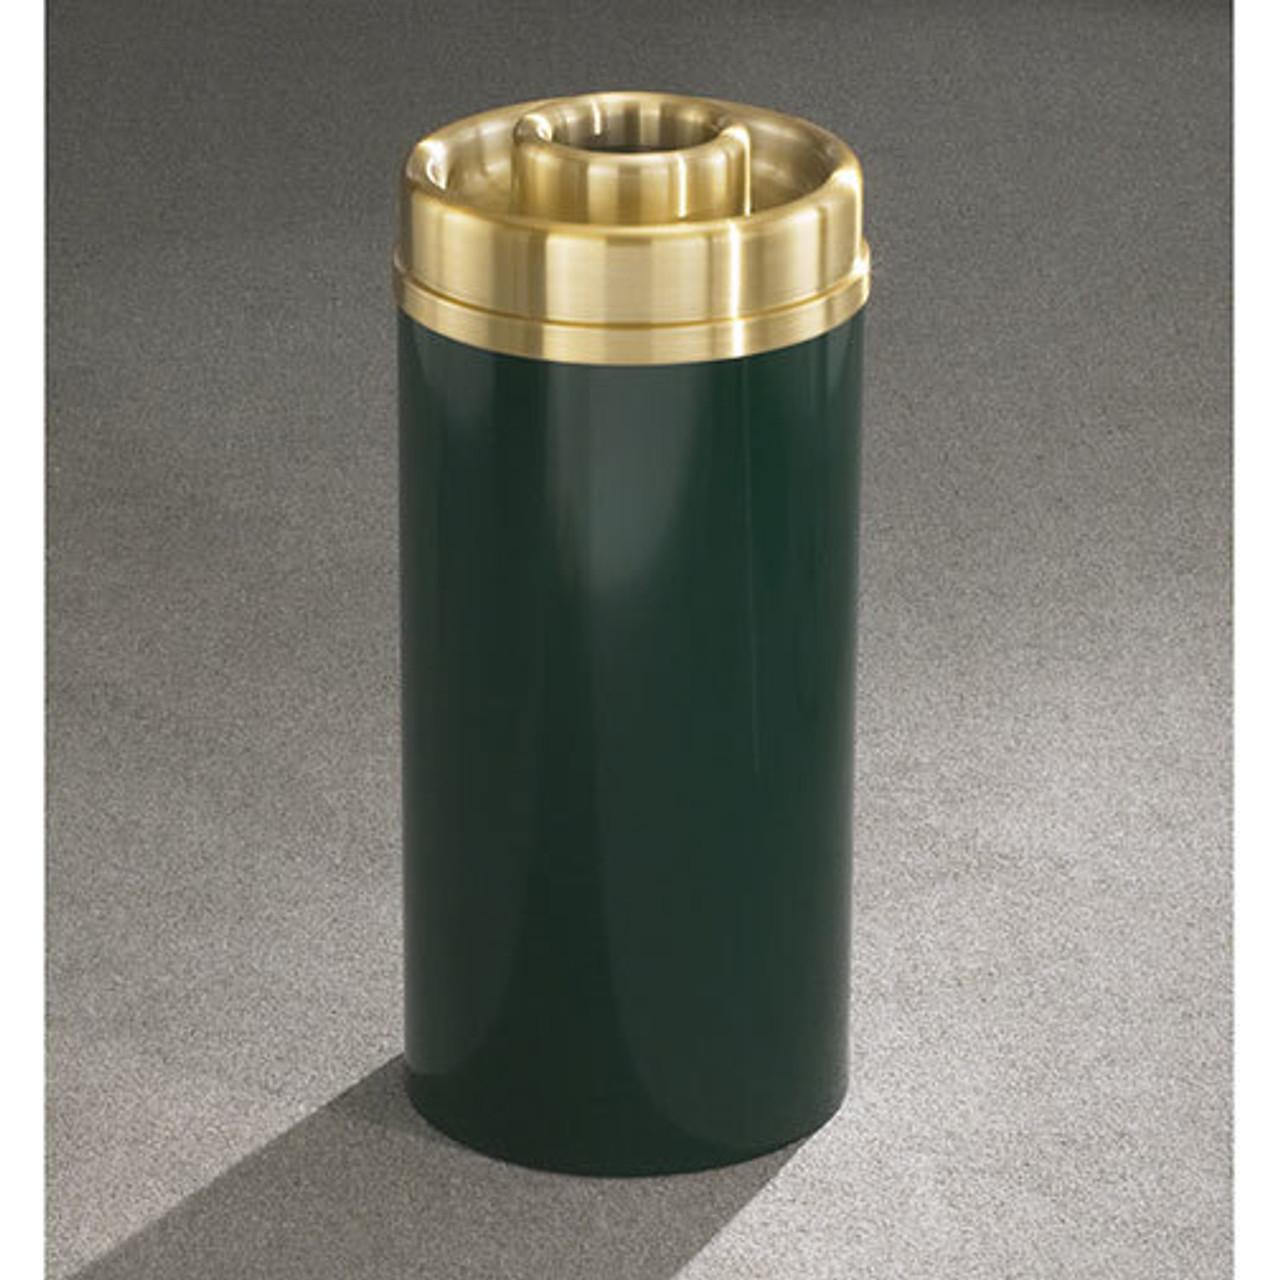 Glaro Mount Everest Steel Ash & Trash - Brass Top